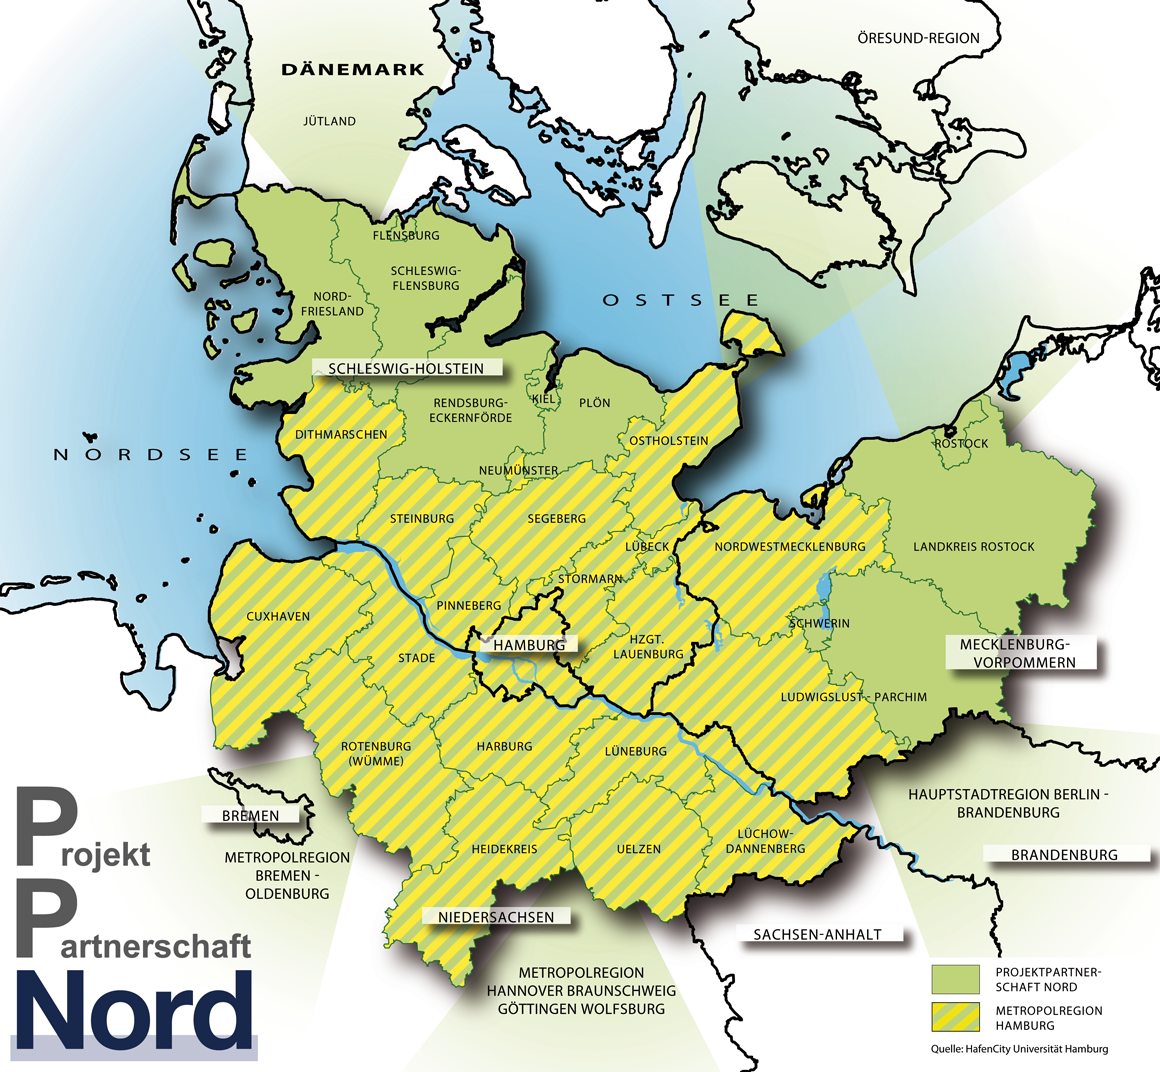 Norddeutschland Karte.Metropolregion Hamburg Projektpartnerschaft Nord Metropolregion